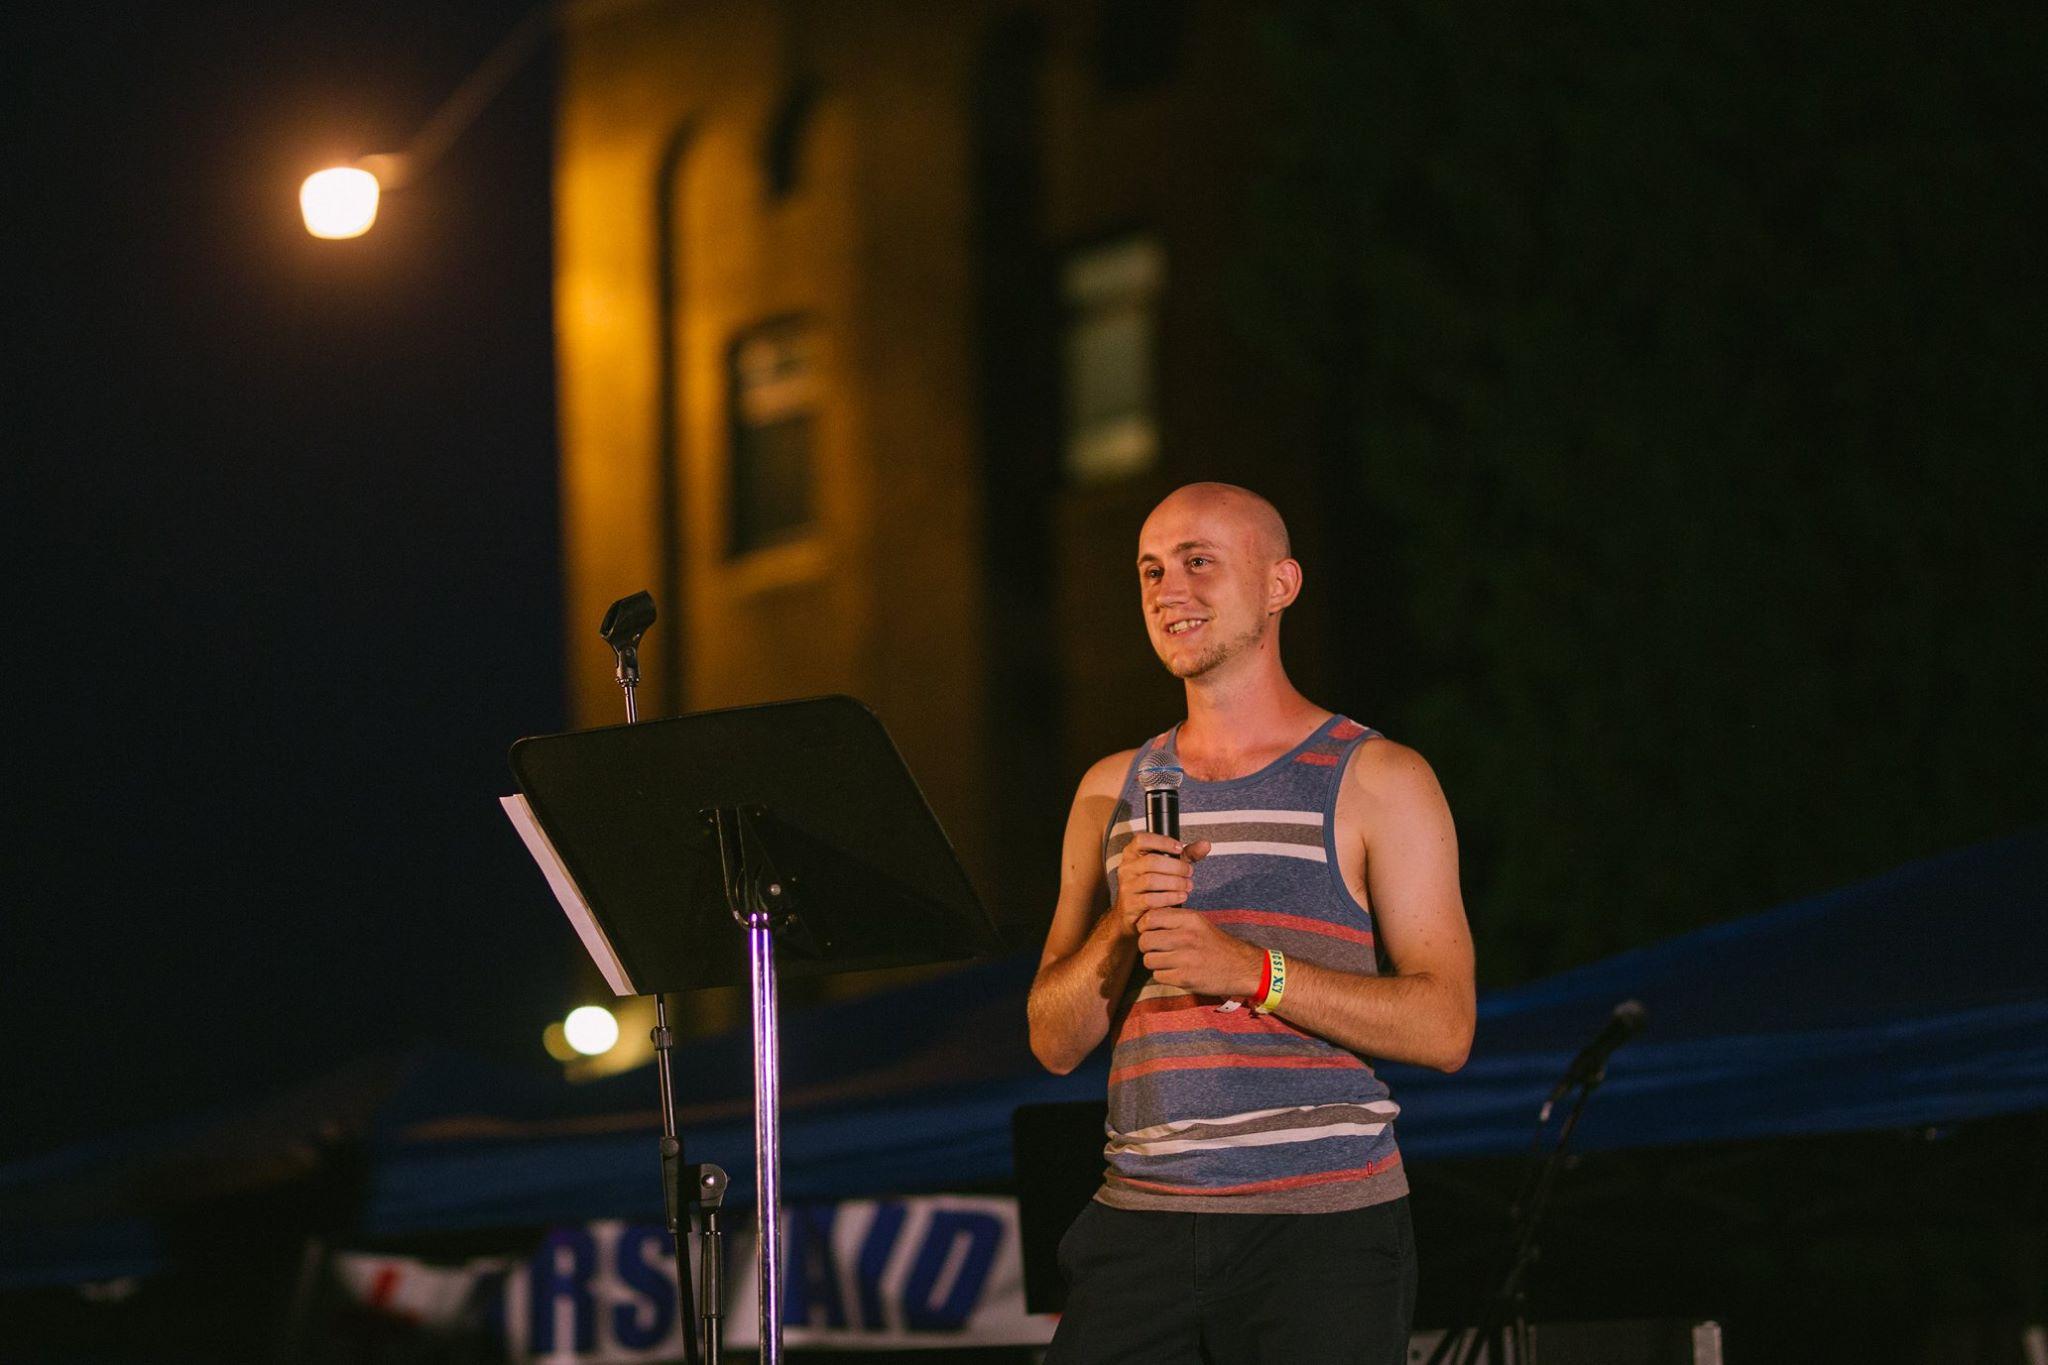 Greg Couweleers - Community Care Coordinator